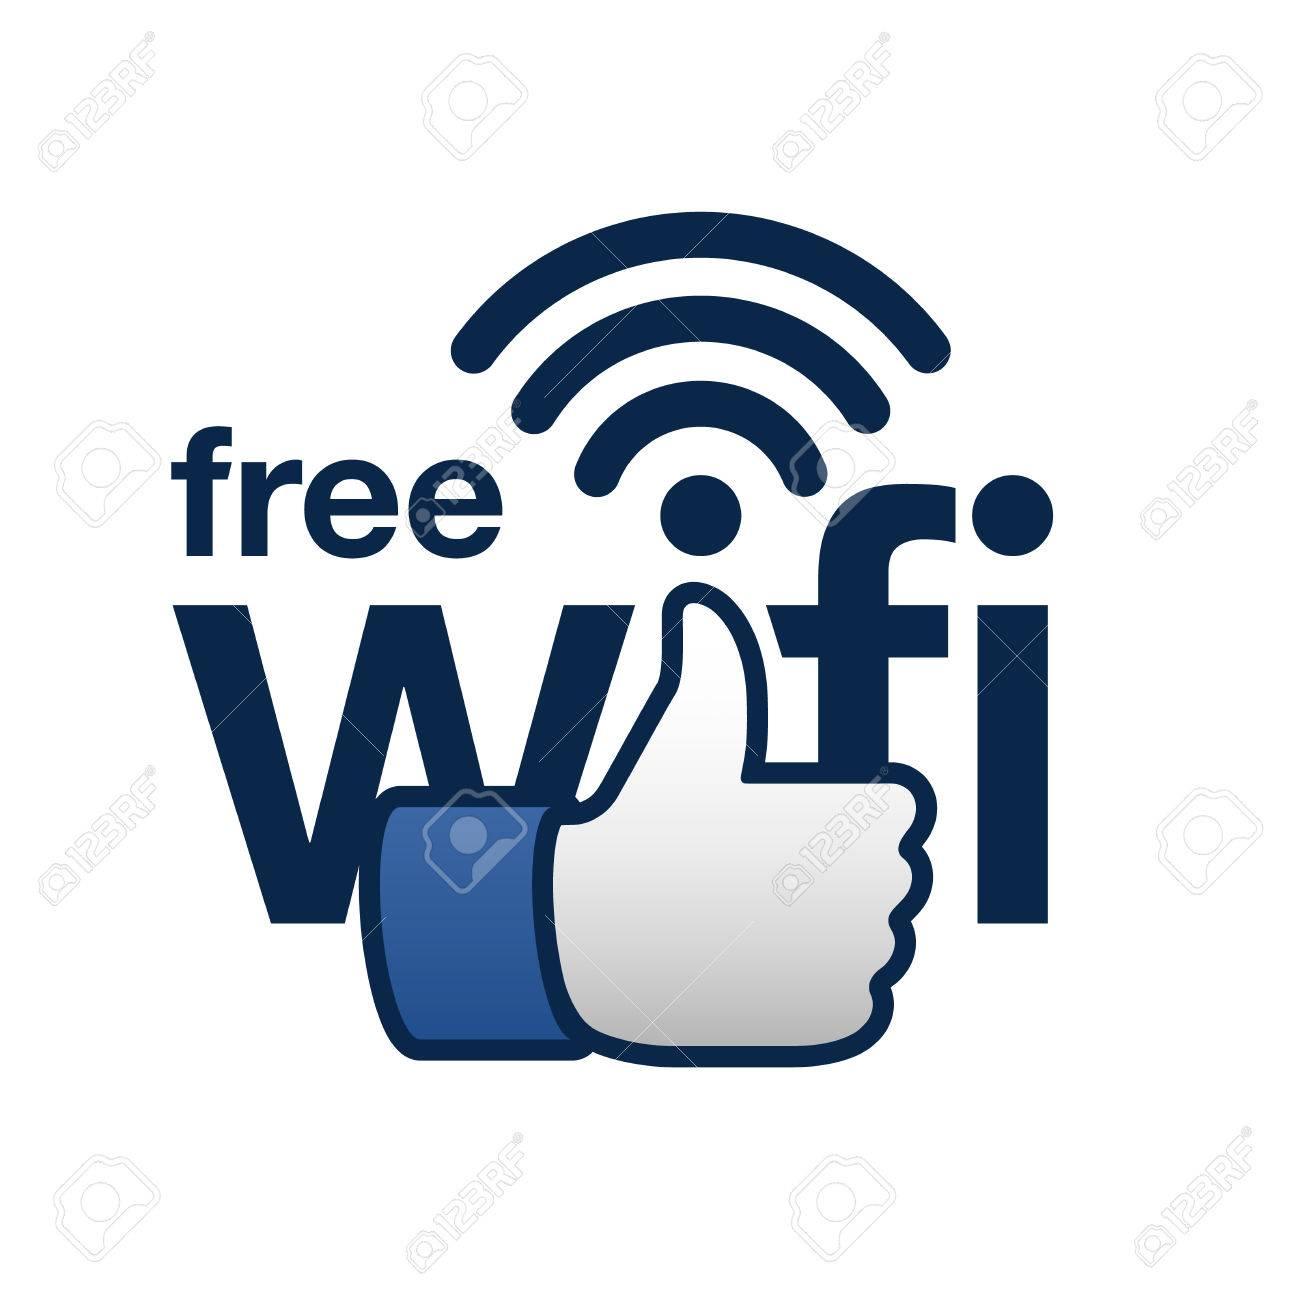 Free wifi here sign concept Standard-Bild - 38732203